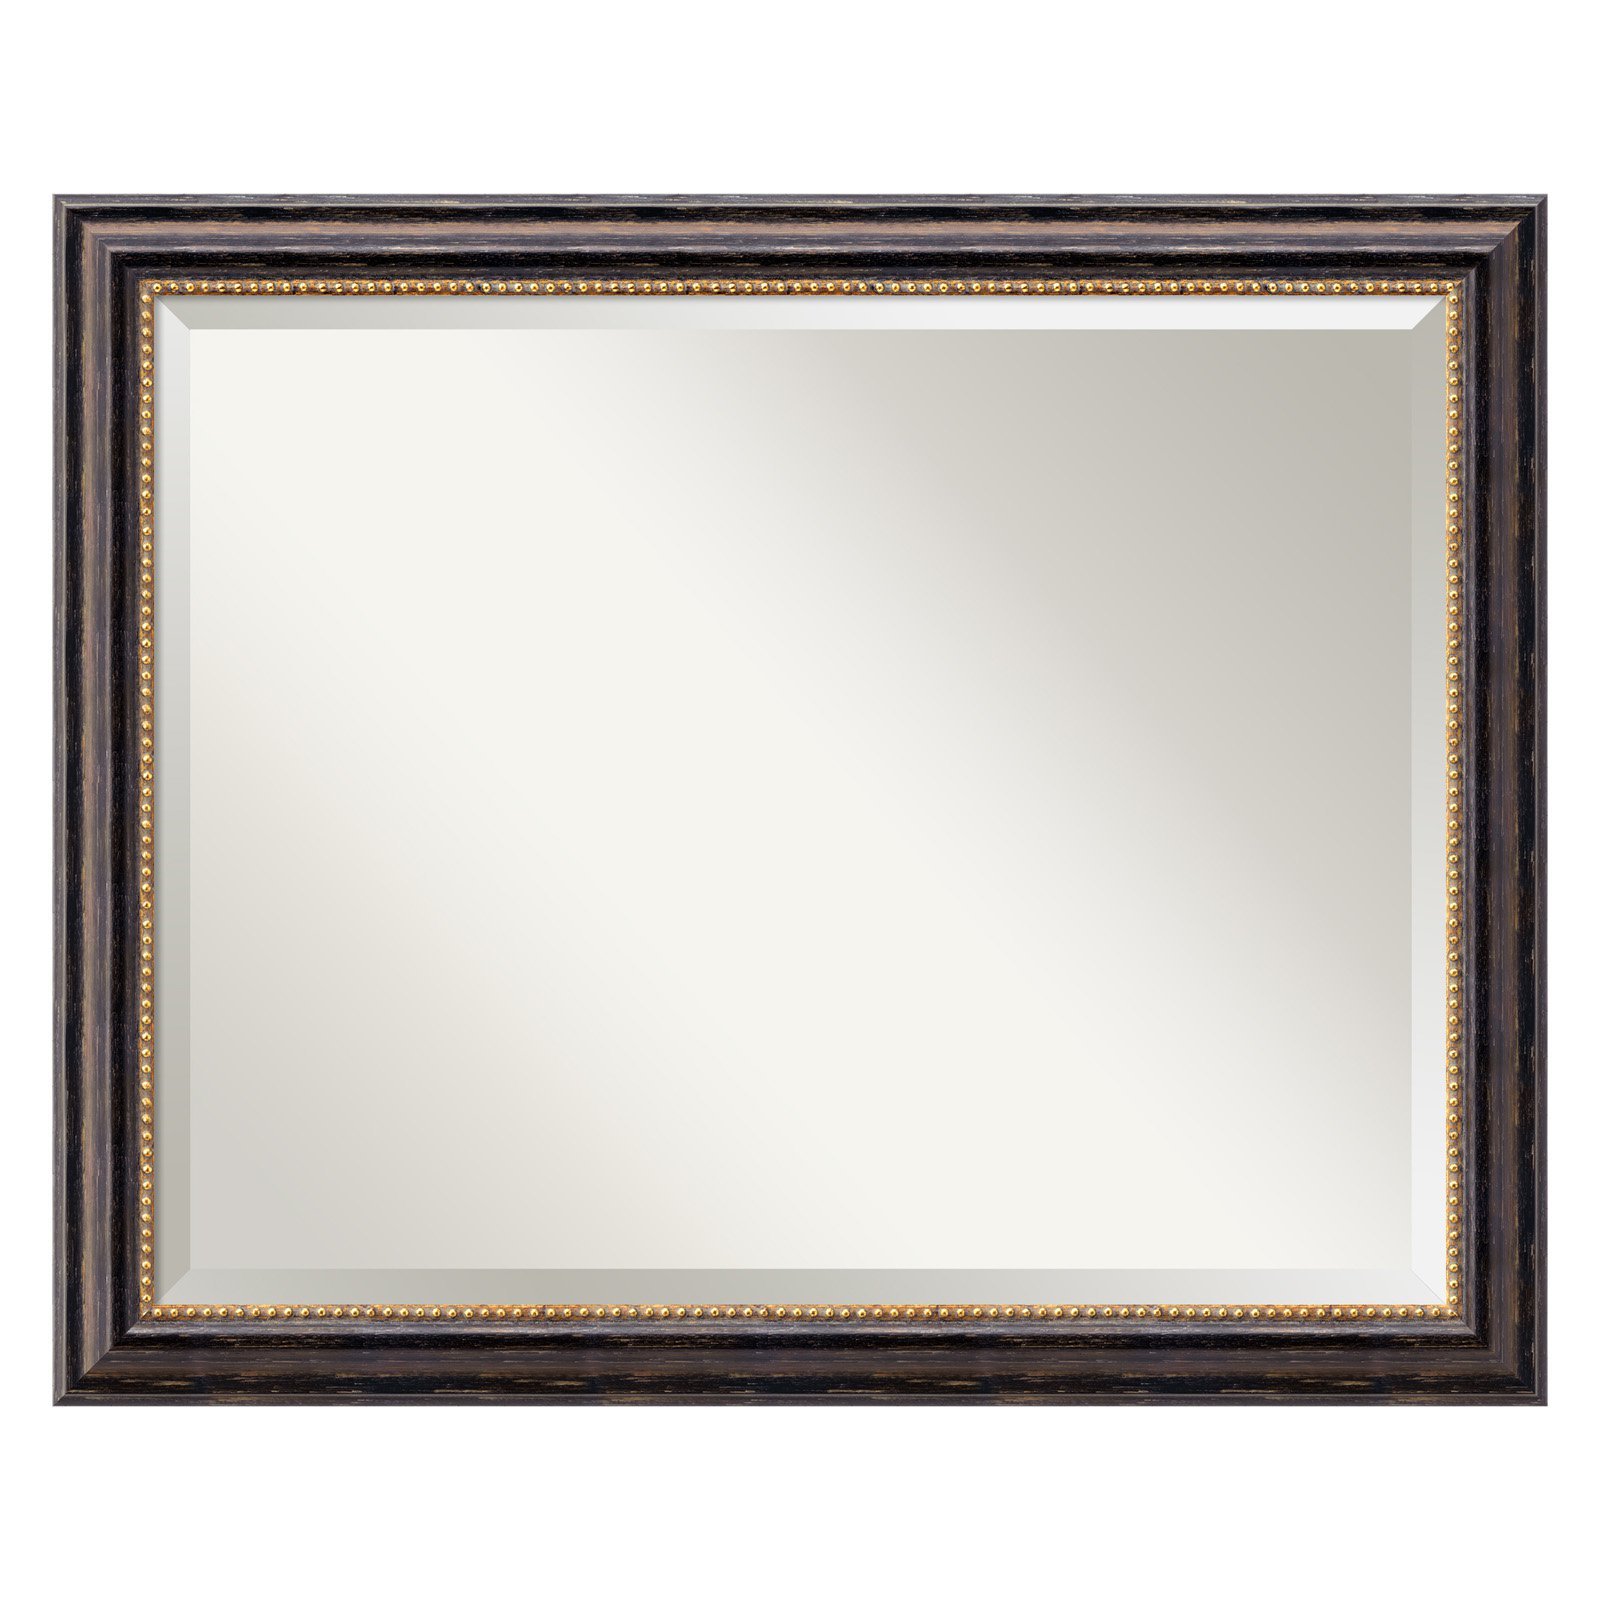 Amanti Art Tuscan Rustic Bathroom Mirror